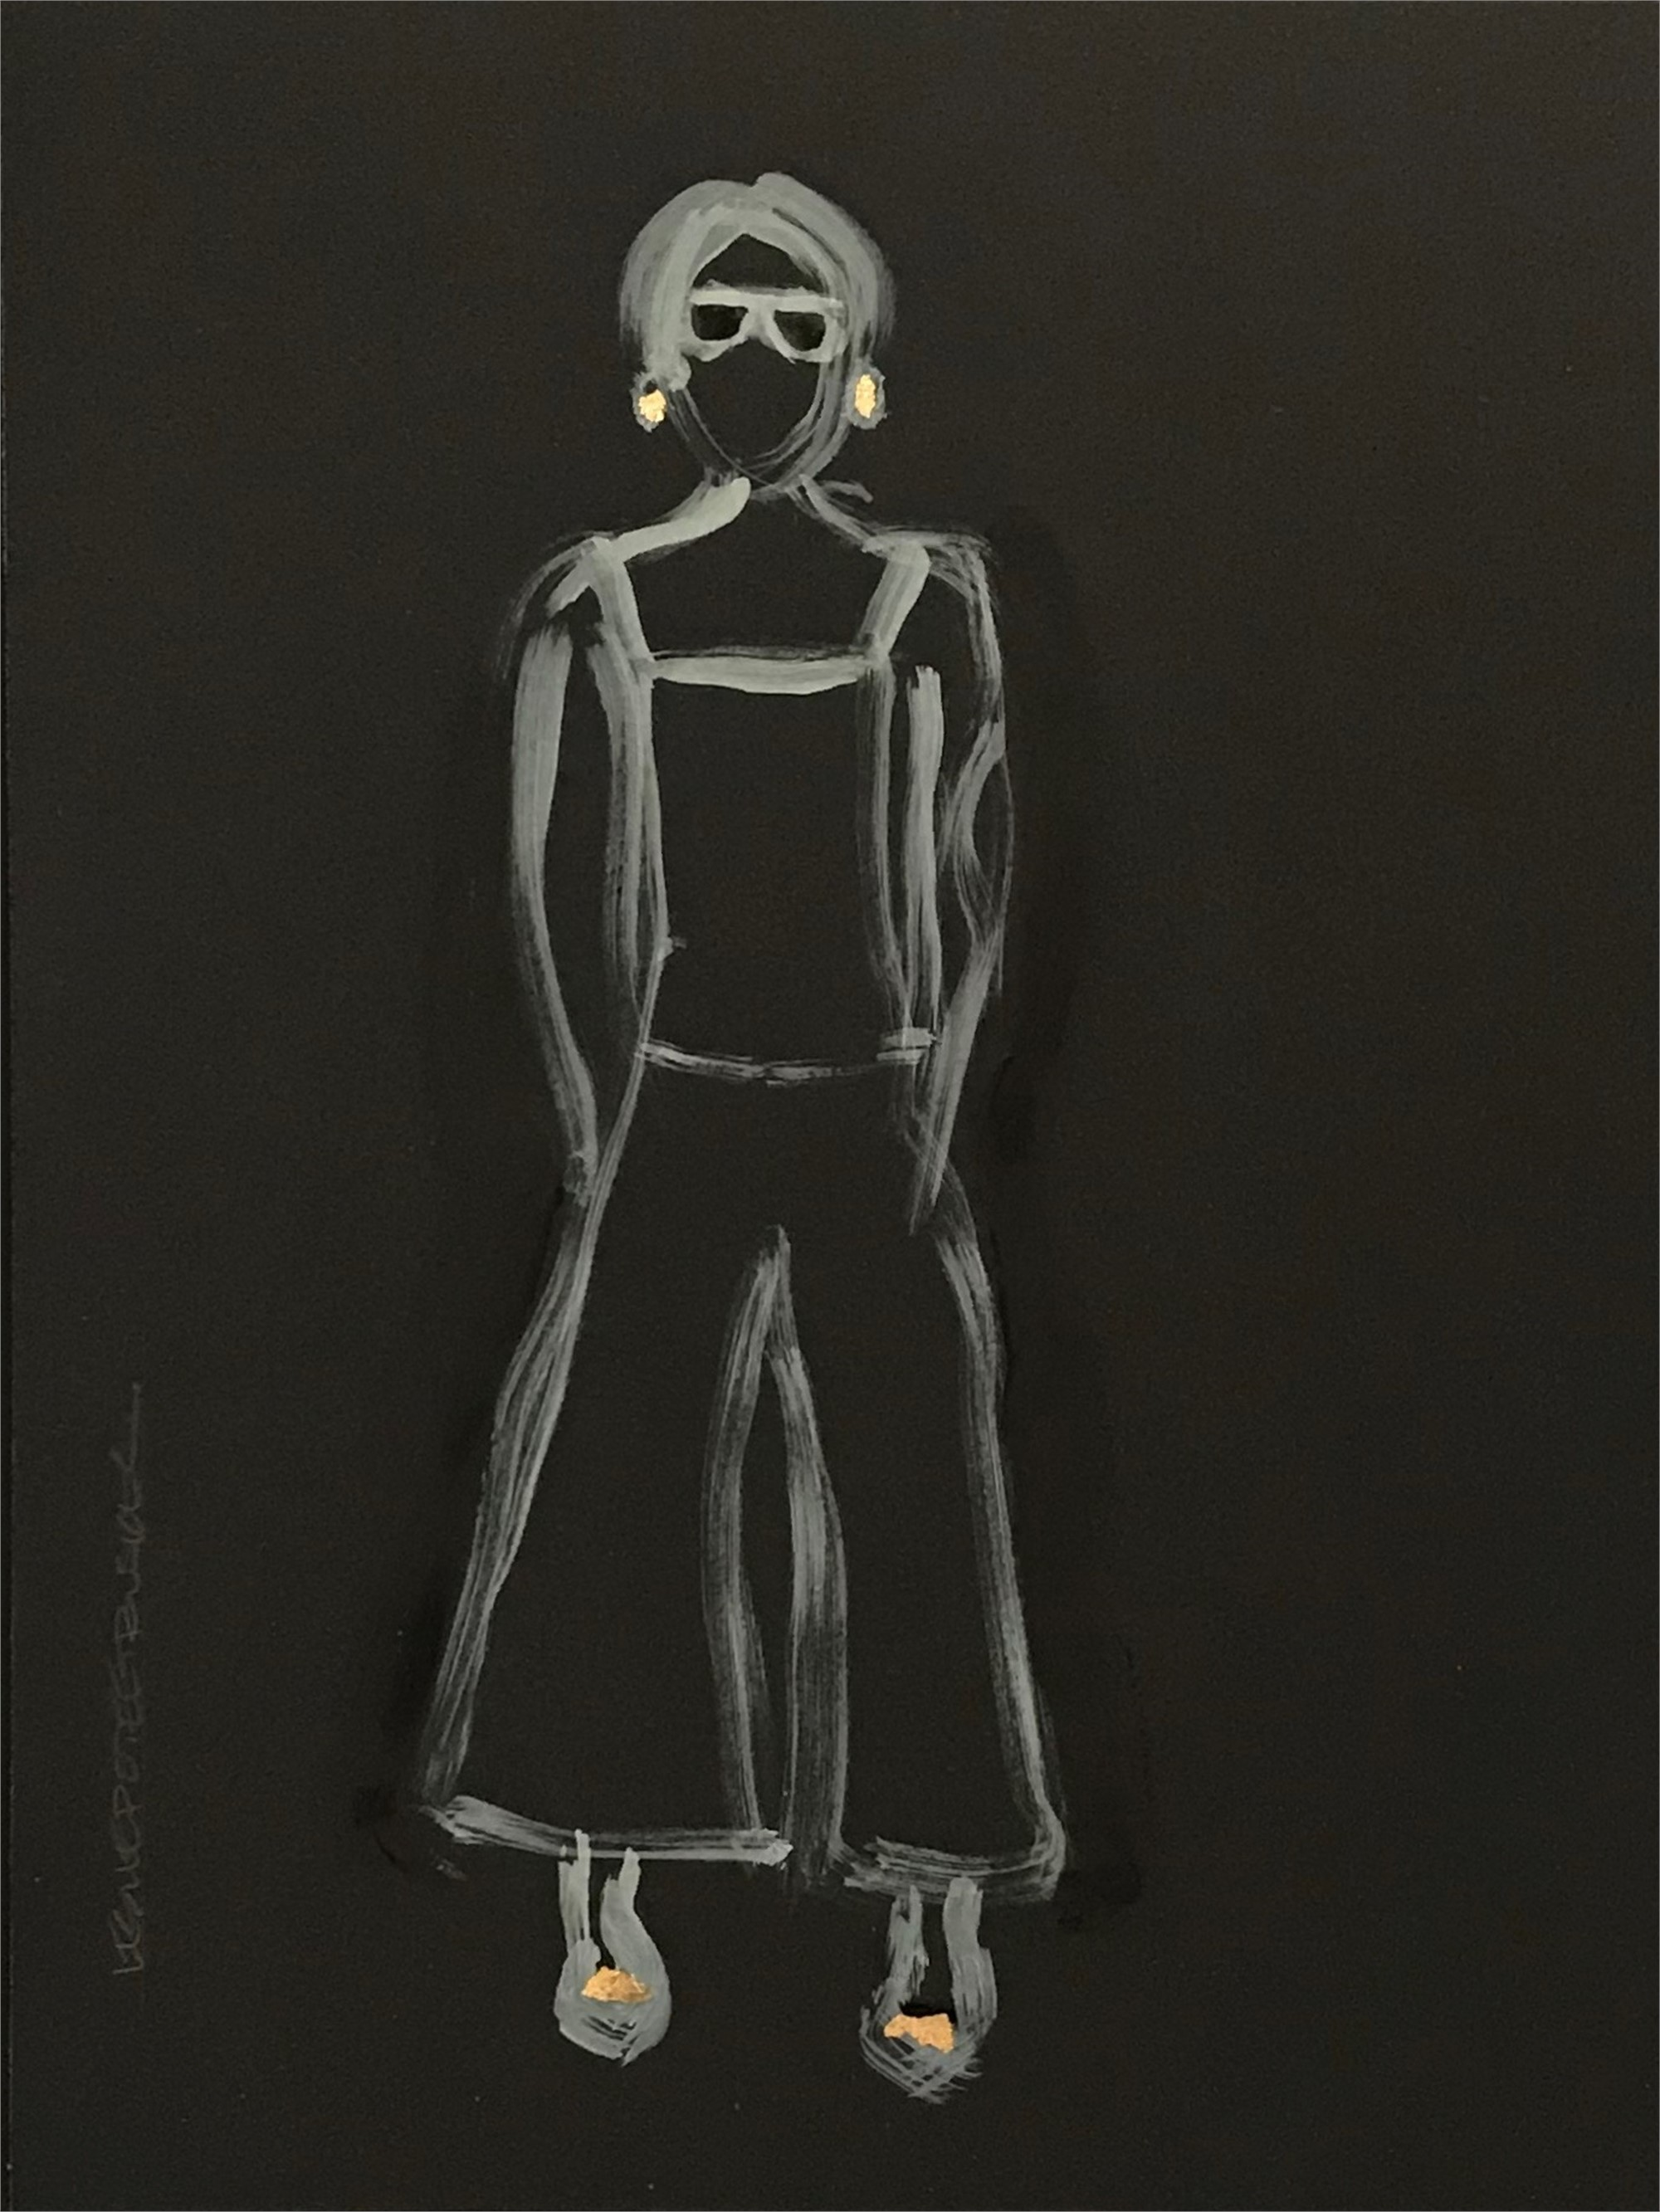 Figure No. 57 by Leslie Poteet Busker